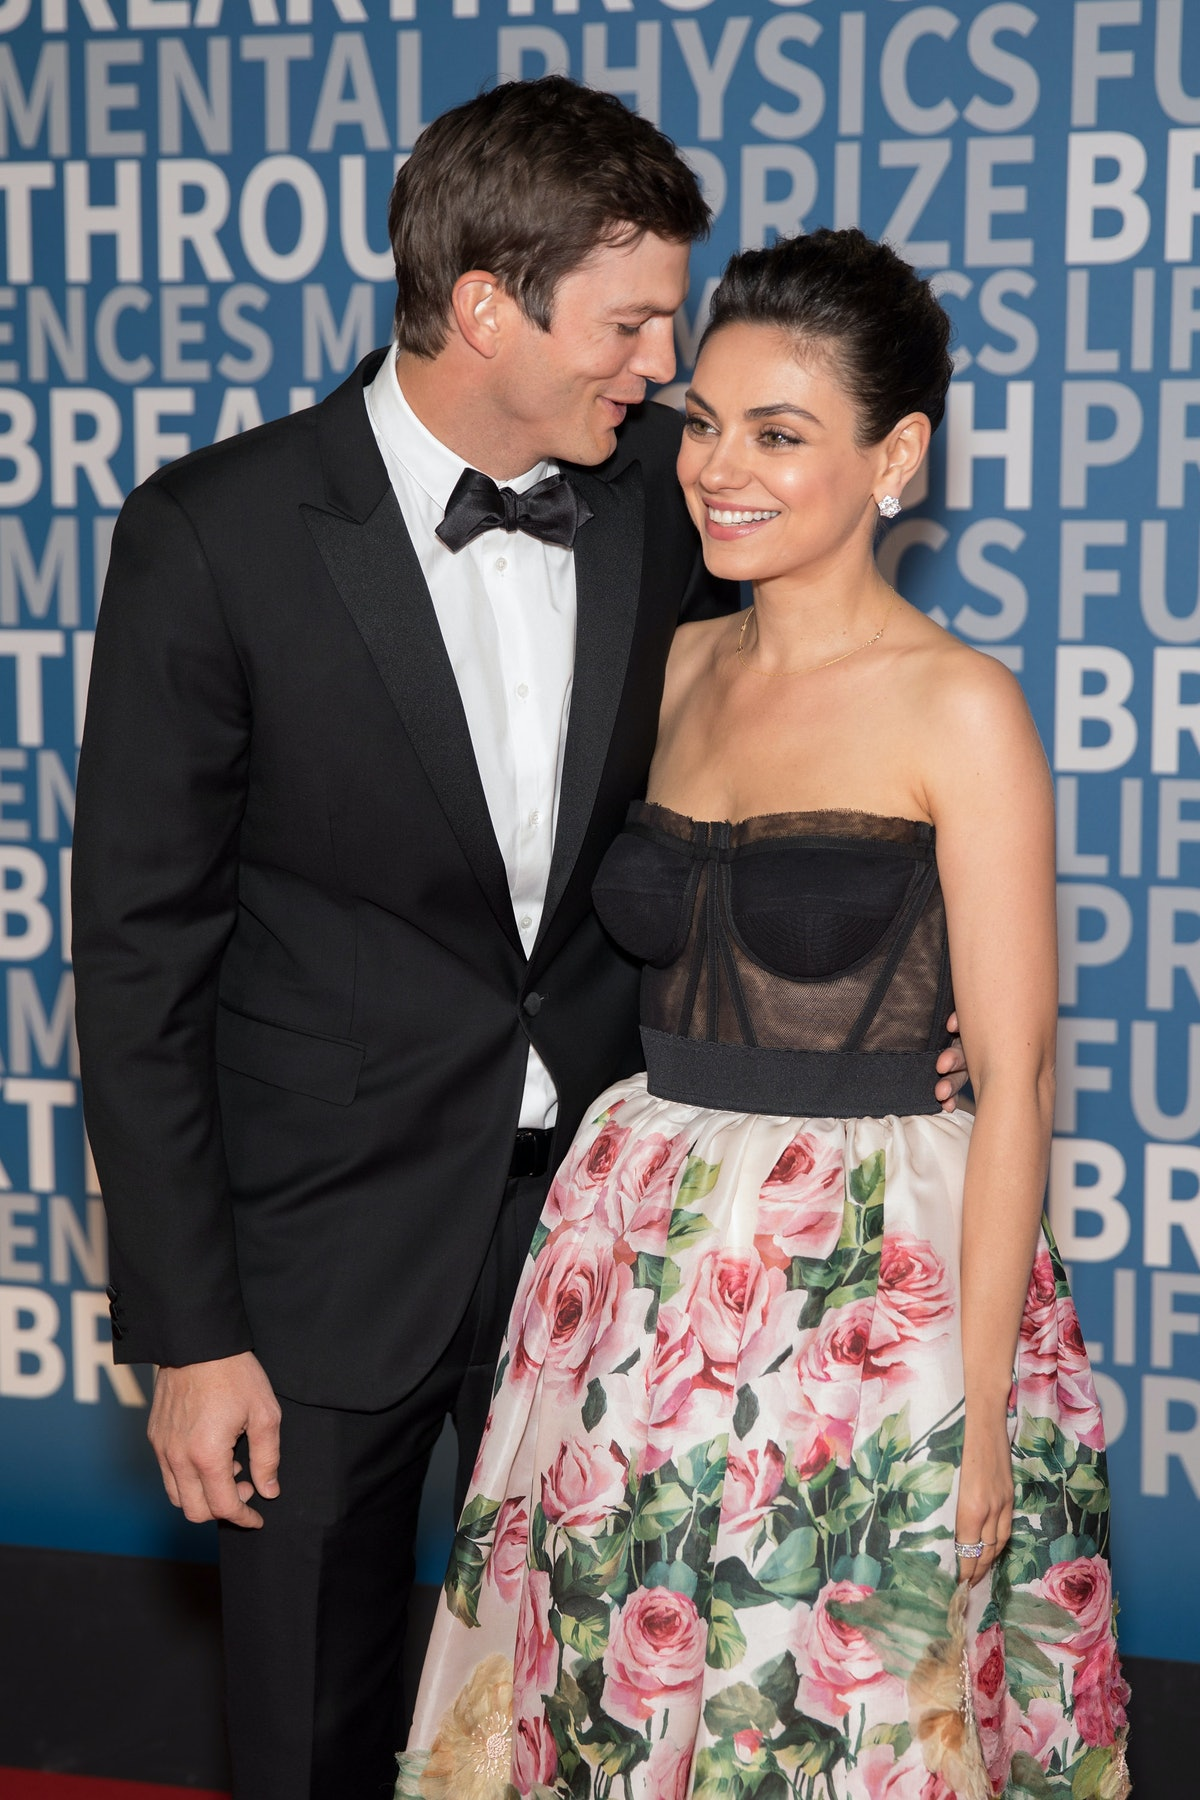 MOUNTAIN VIEW, CA - DECEMBER 03:  Actors Ashton Kutcher and Mila Kunis arrive at the 2018 Breakthrou...